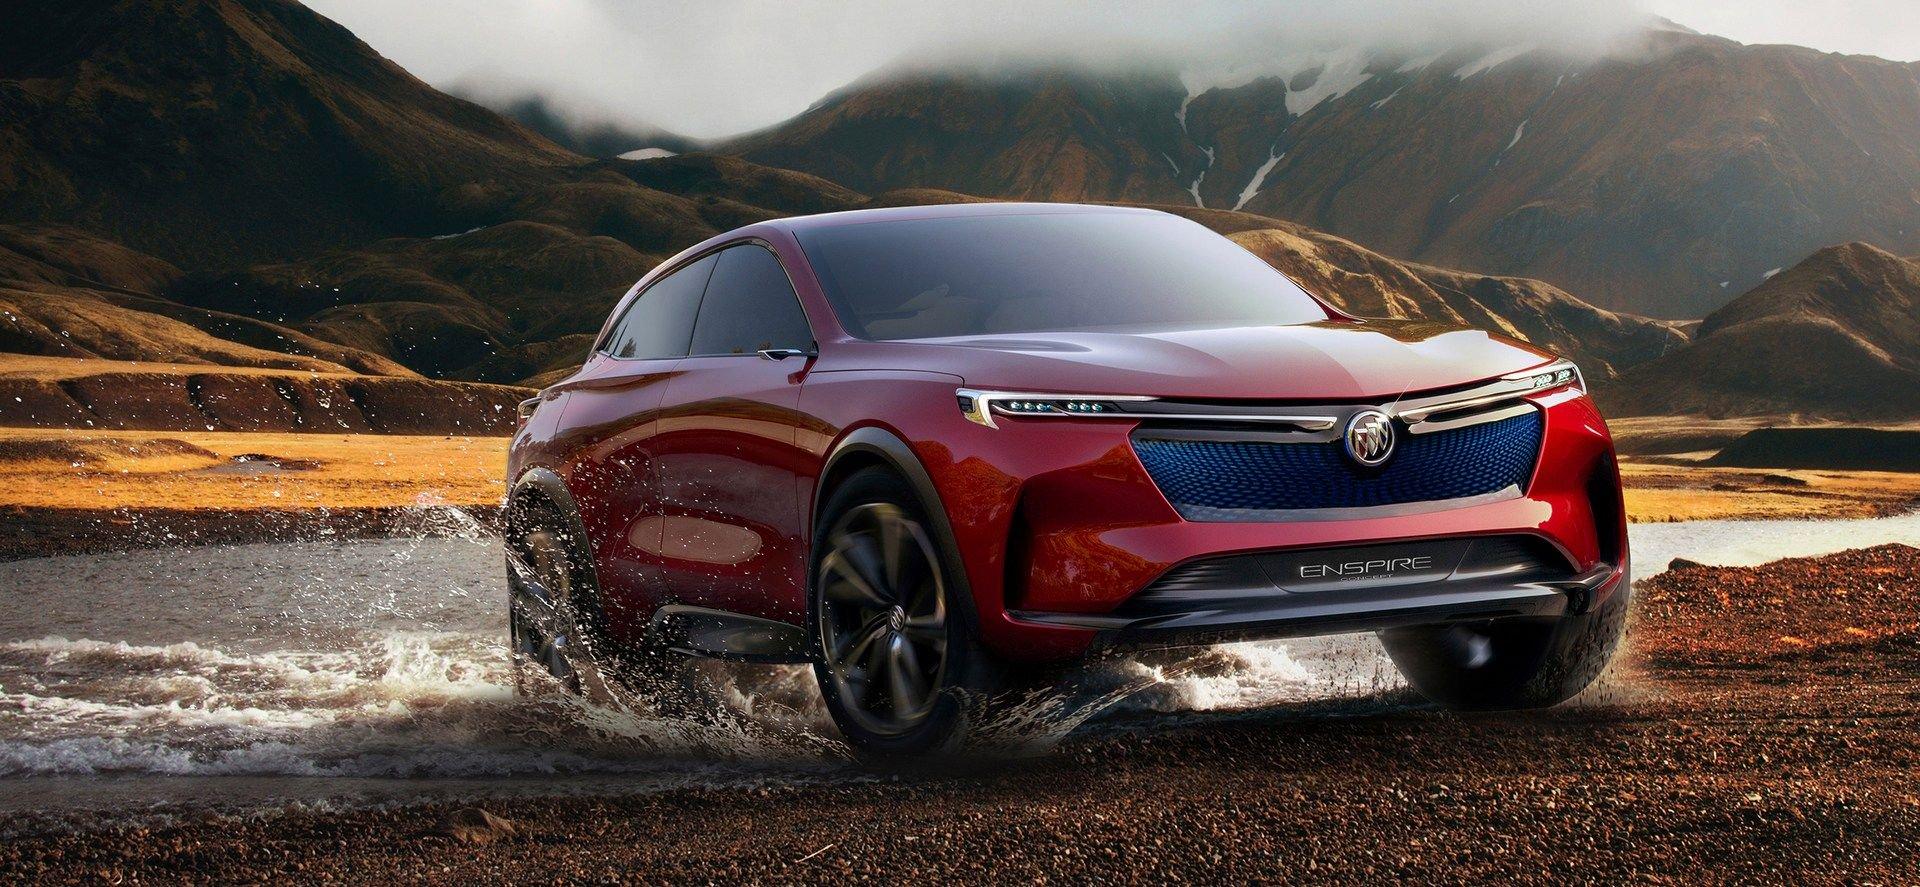 Buick-Enspire-Concept-2.jpg